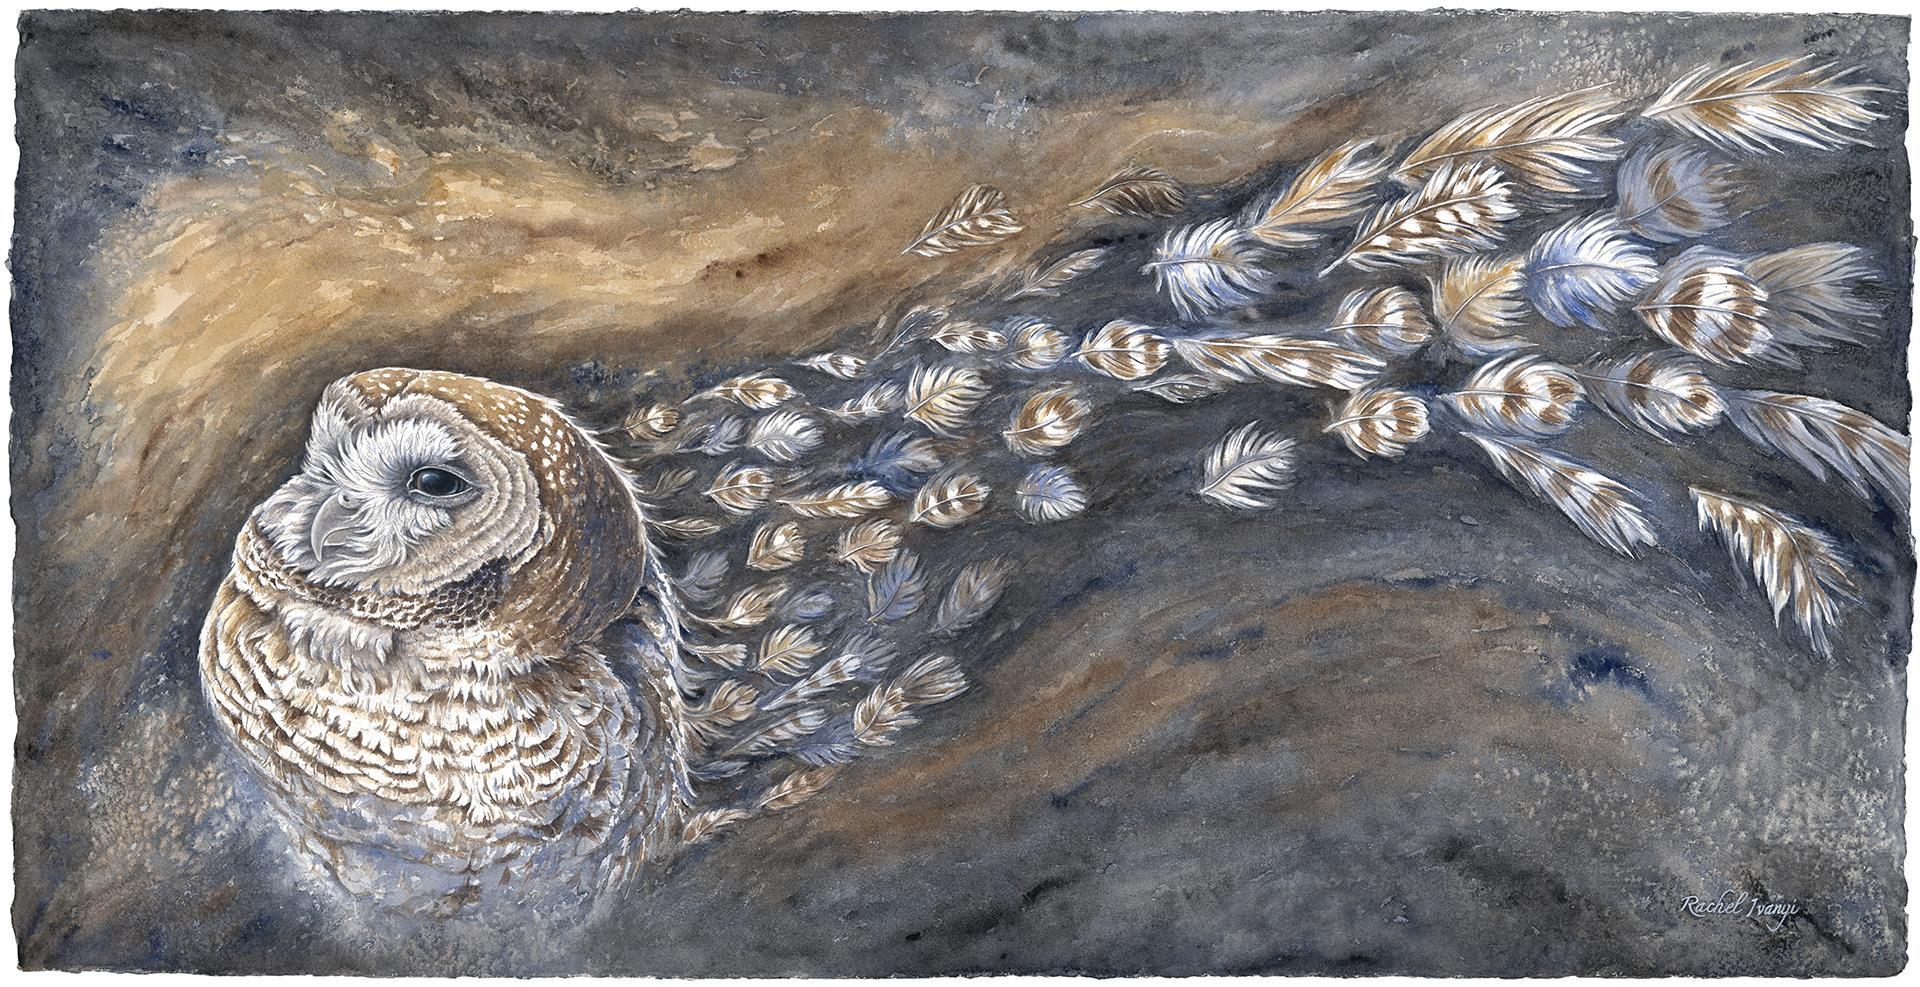 Permanence? California Spotted Owl, Rachel Ivanyi